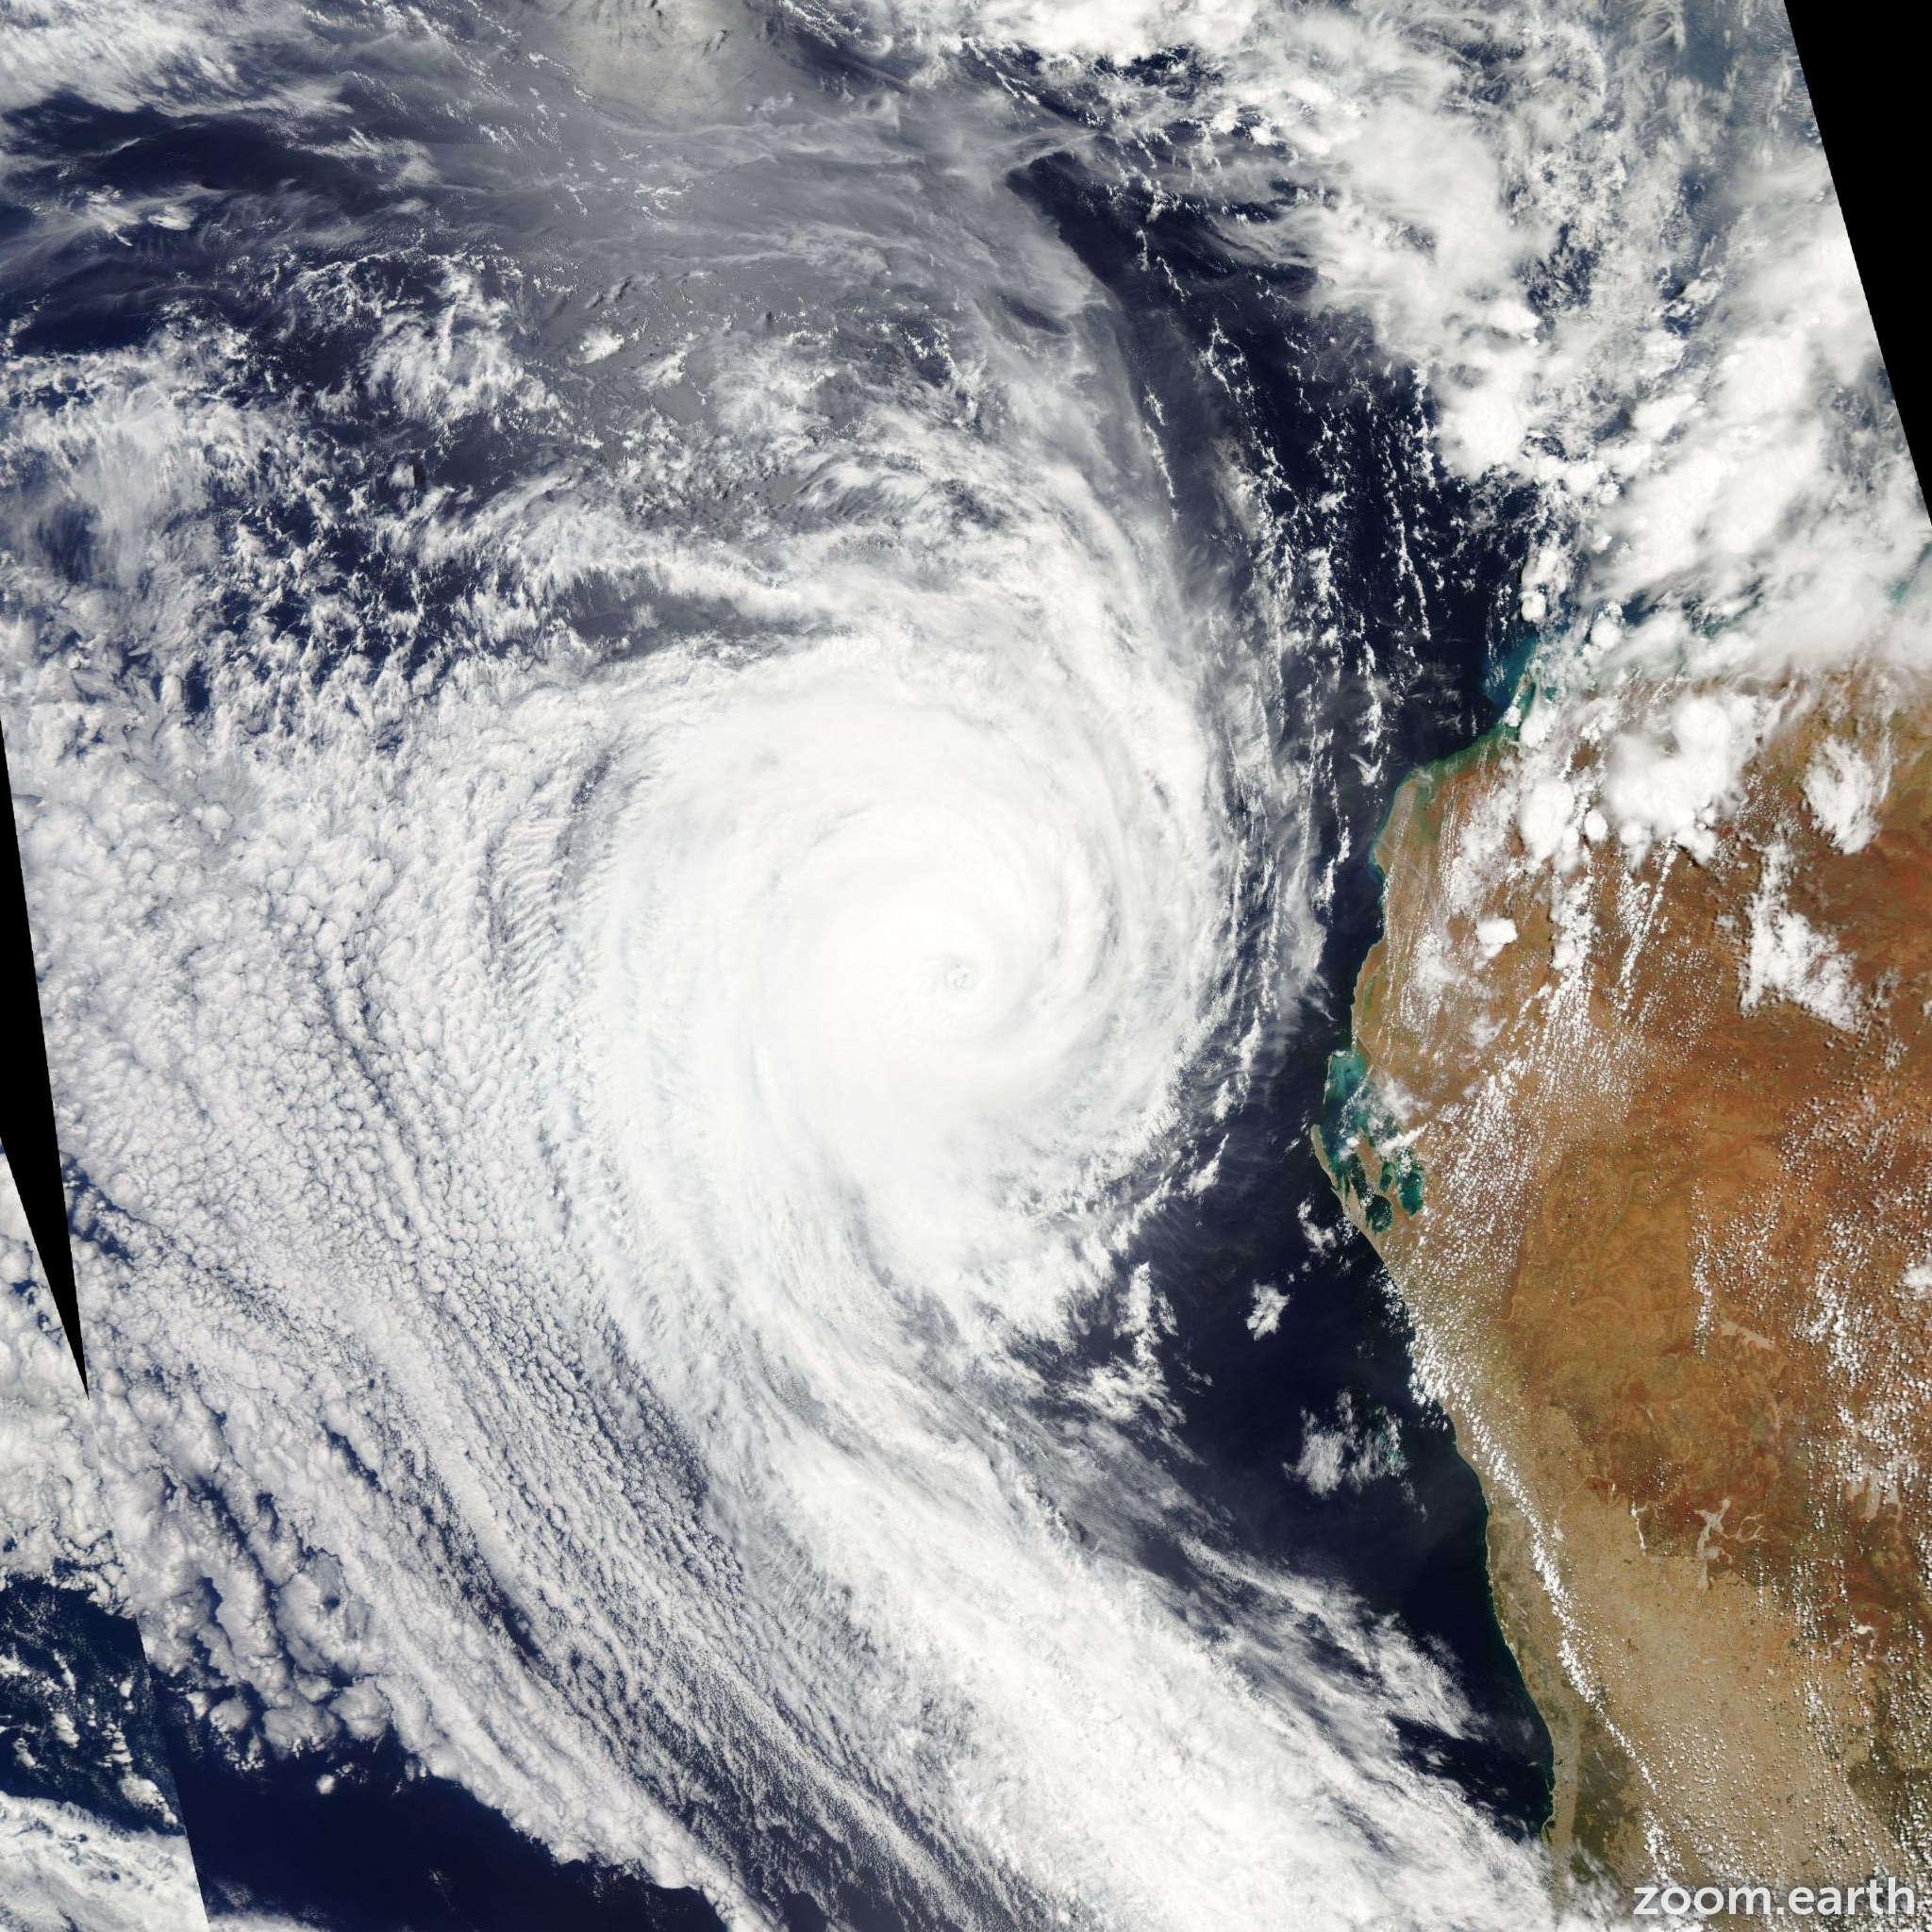 Satellite image of Cyclone Bianca 2011